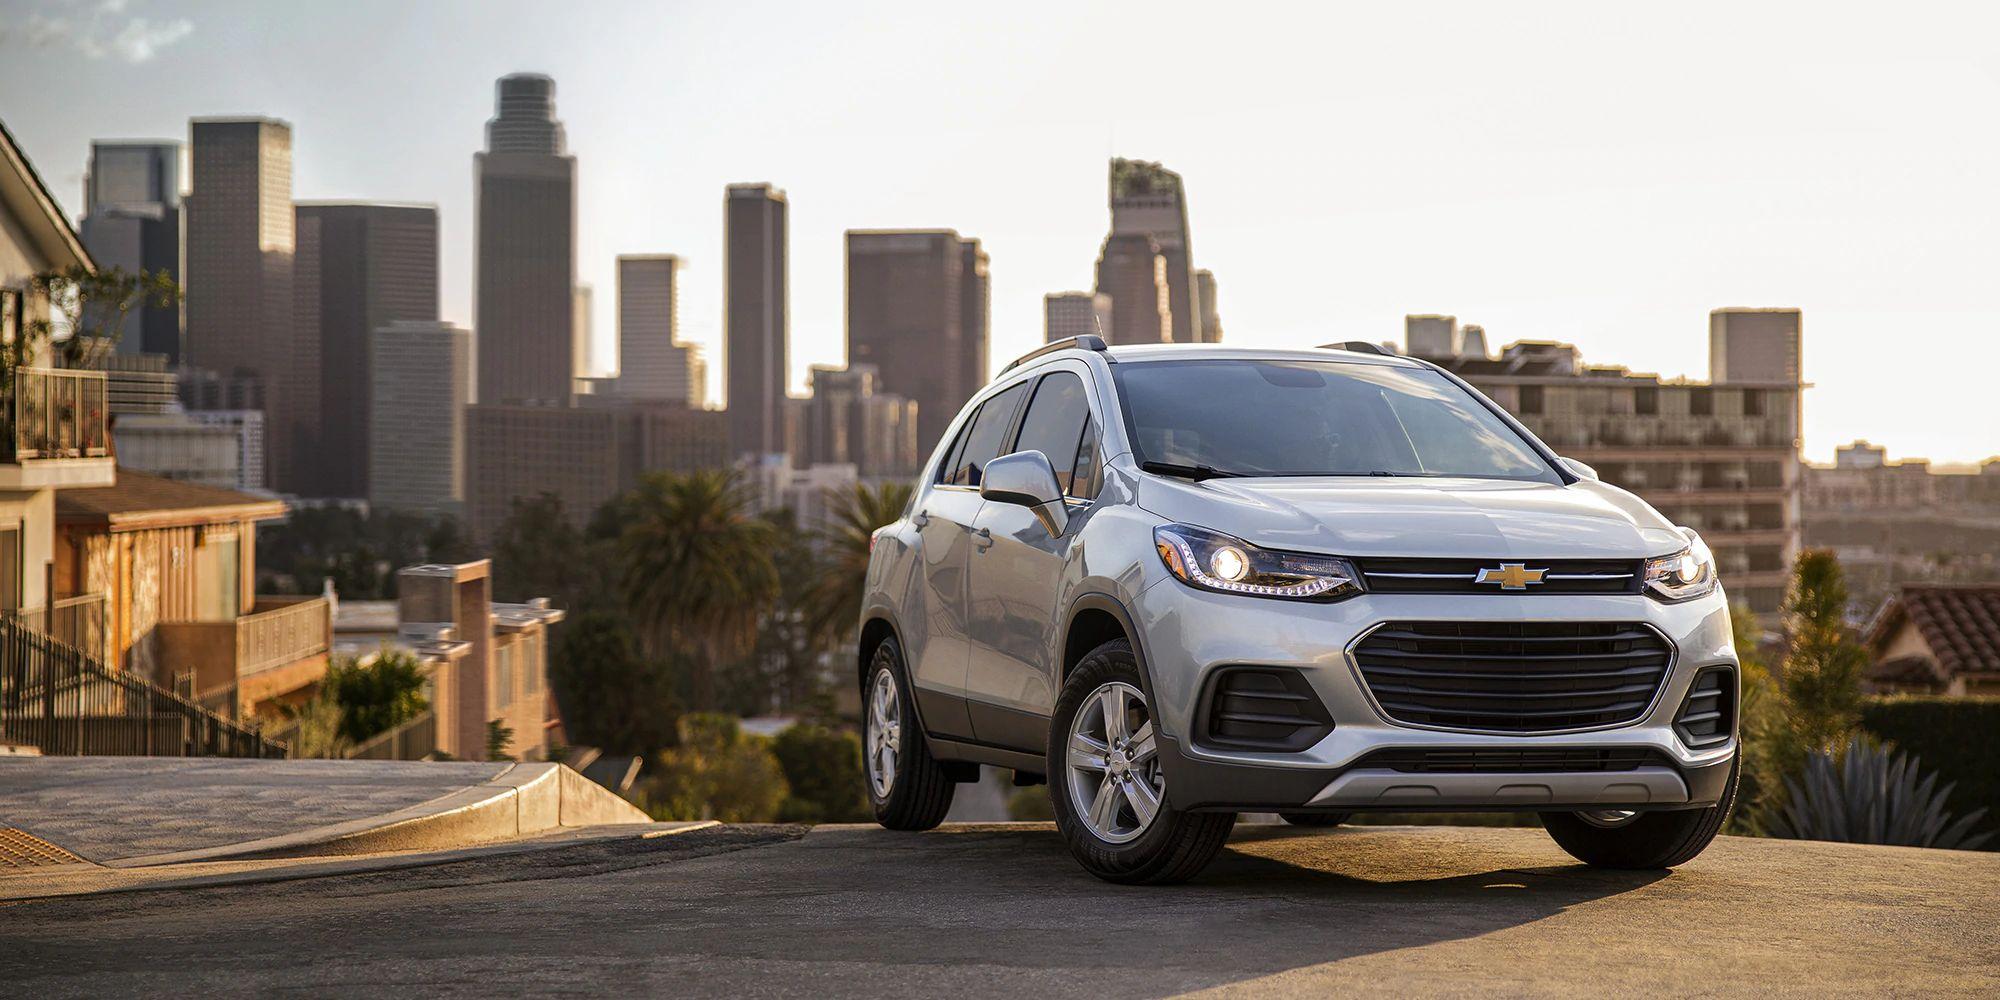 2021 Chevrolet Trax Performance